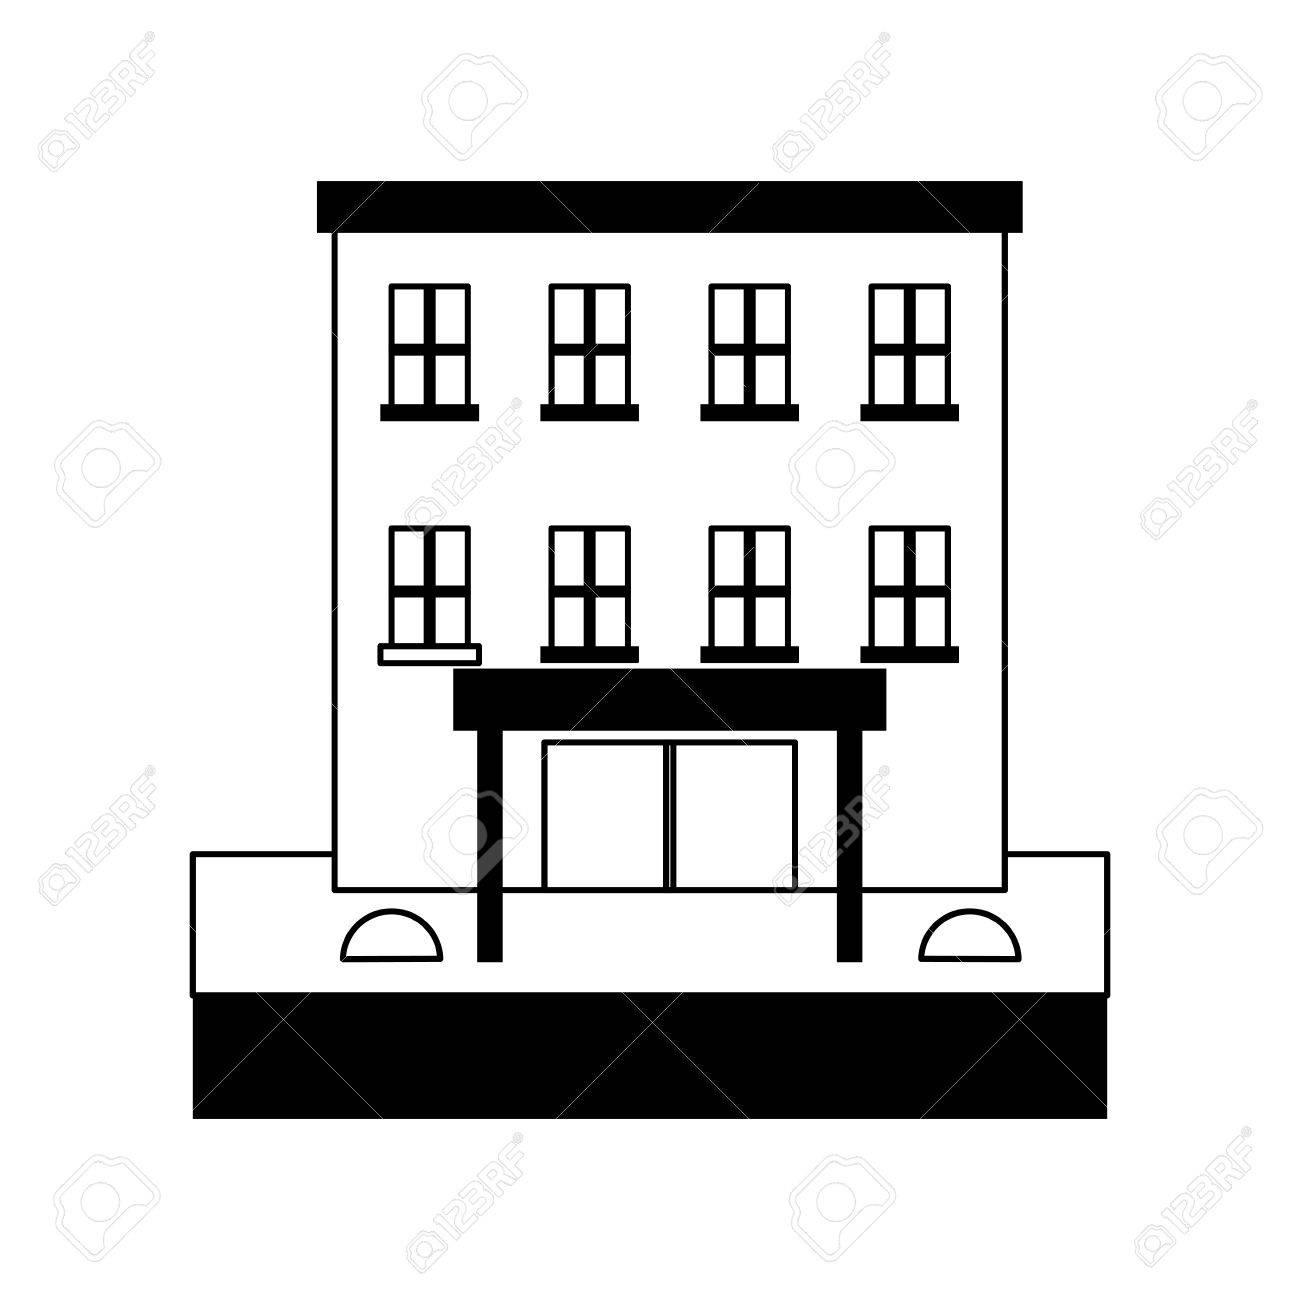 Big City Building Icon Image Vector Illustration Design Black And White Stock